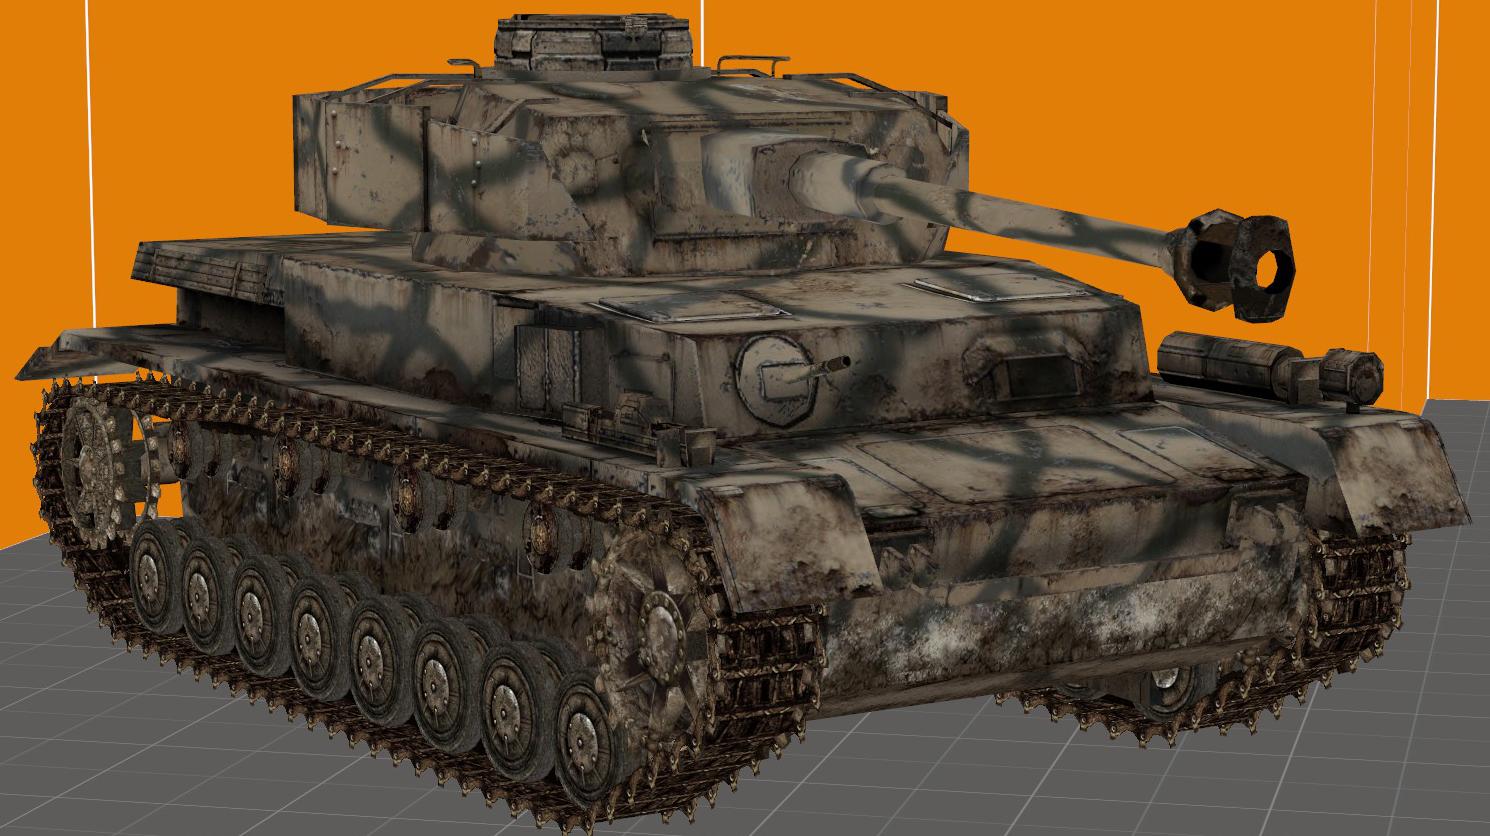 Panzer IV, Model WaW